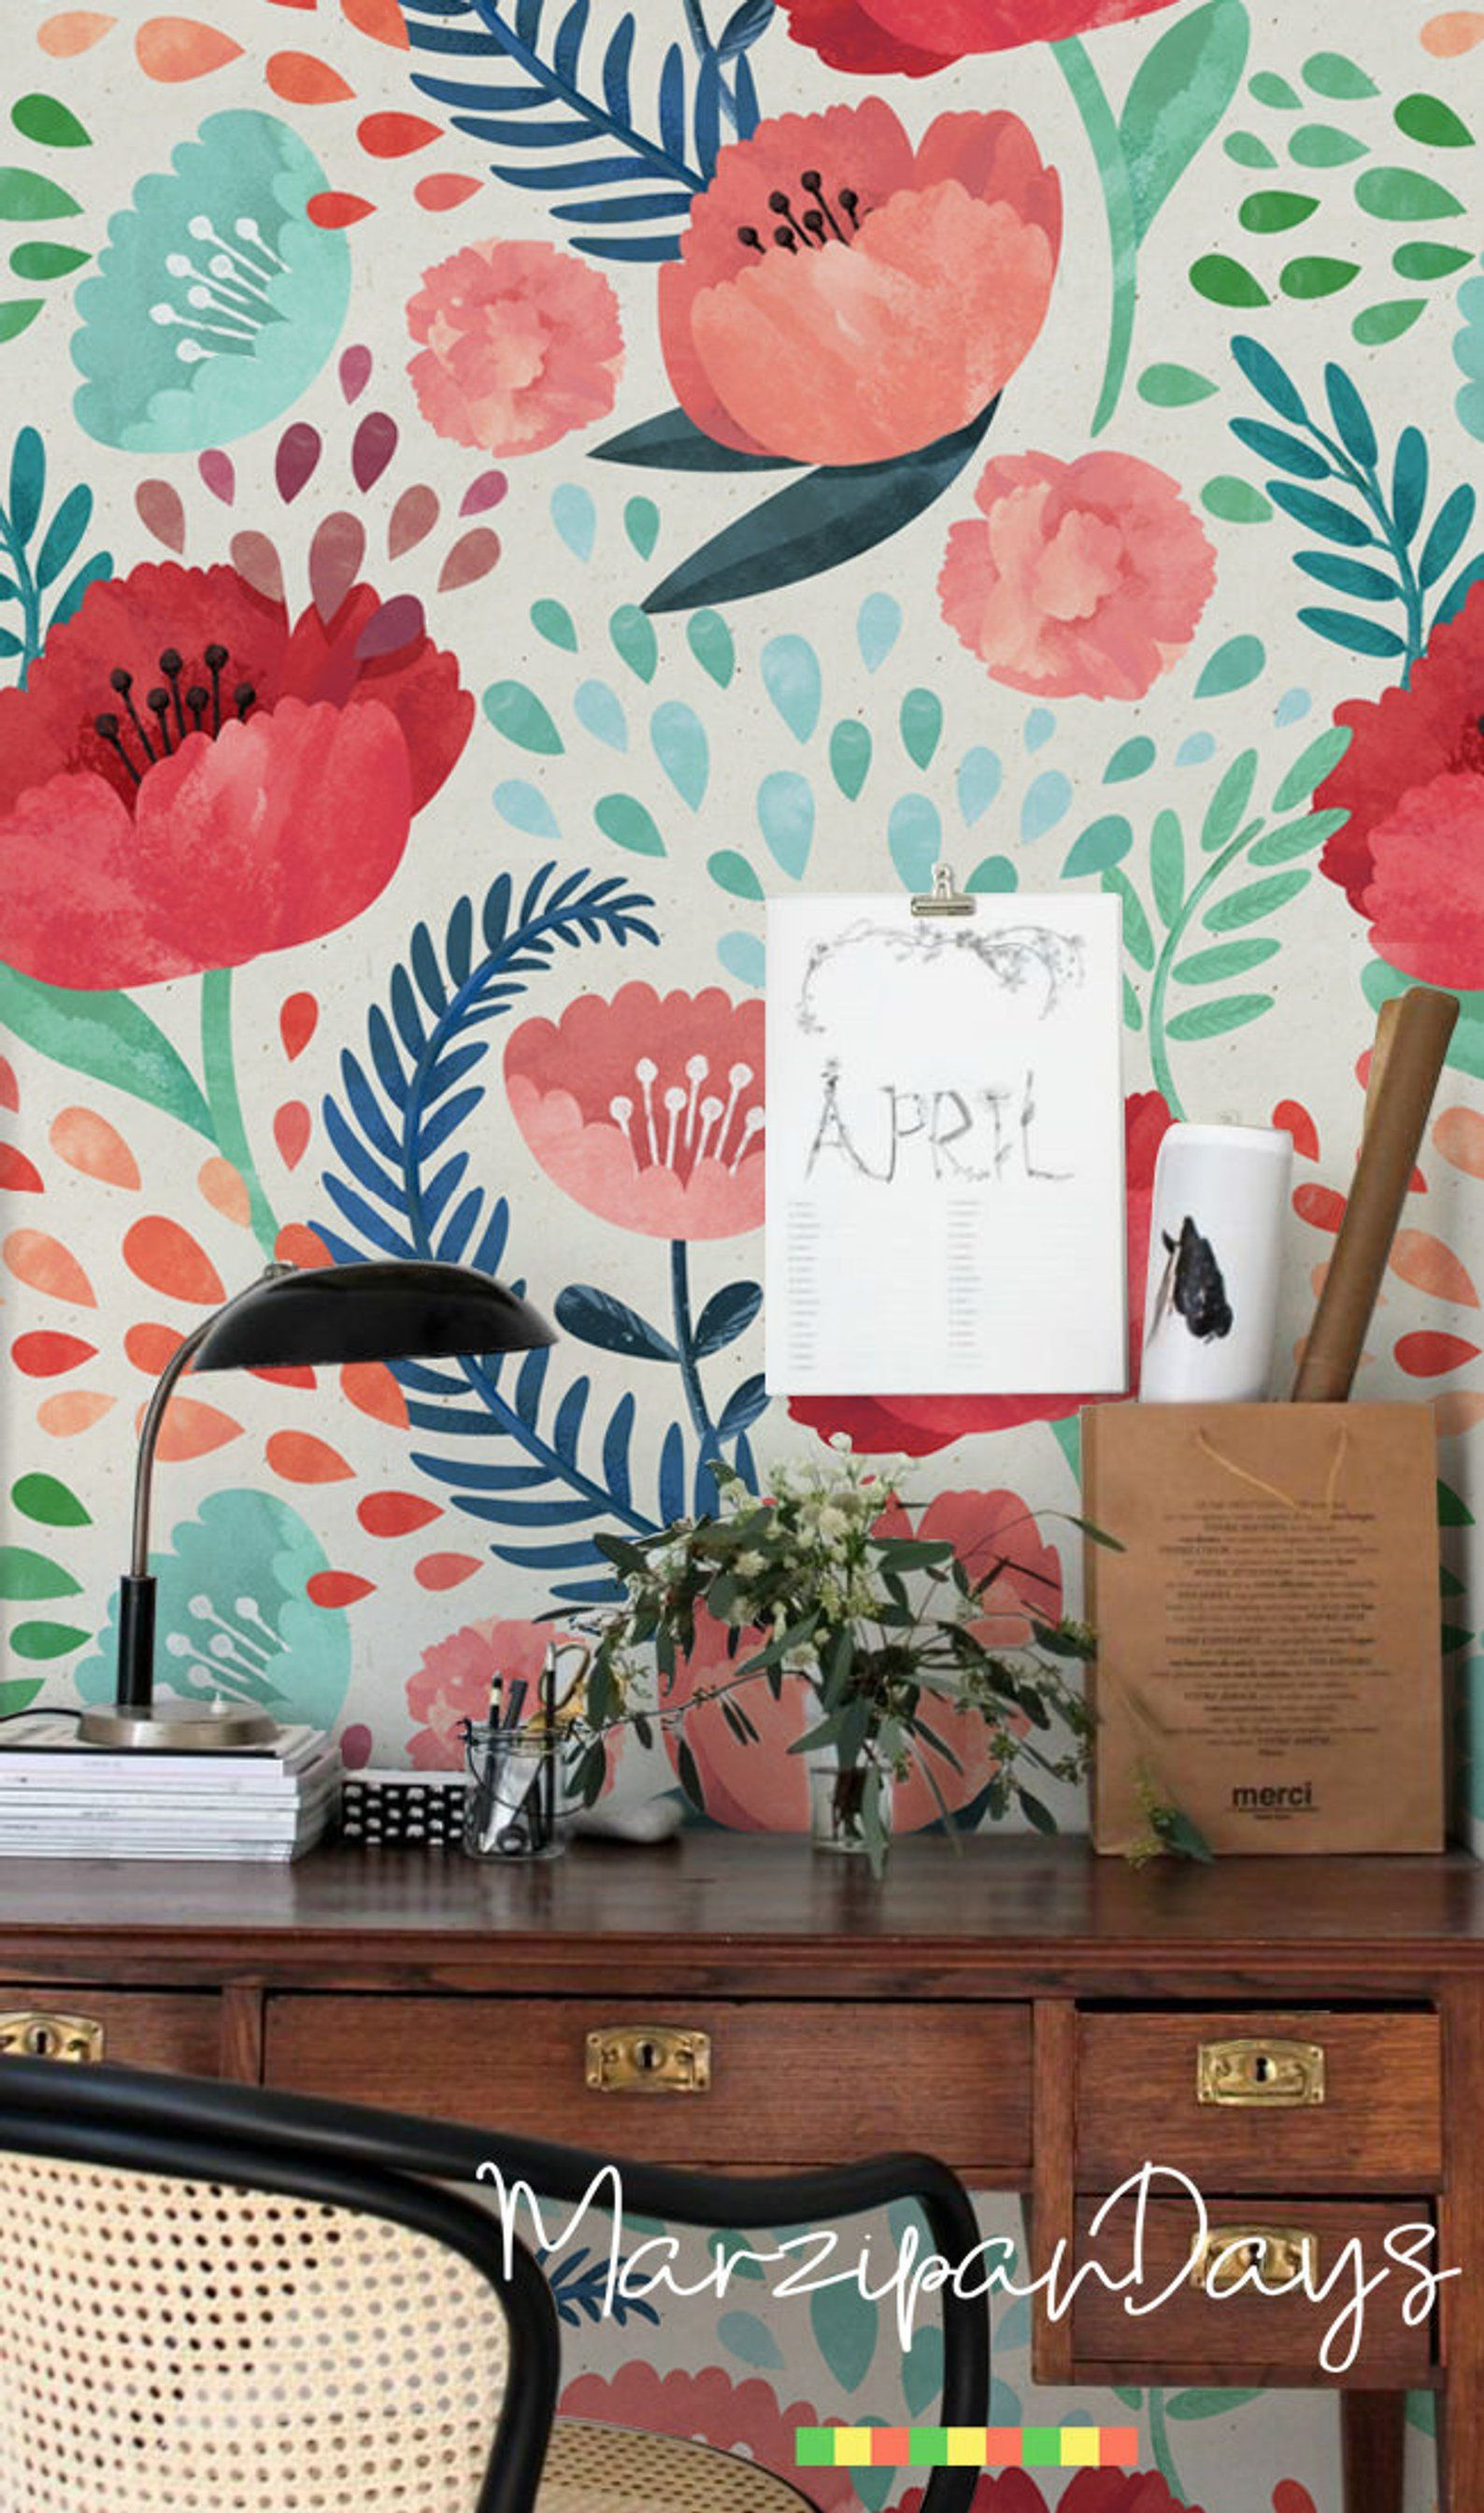 Poppy Wallpaper Poppies Wall Mural Vintage Floral Etsy Poppy Wallpaper Wallpaper Accent Wall Wall Murals